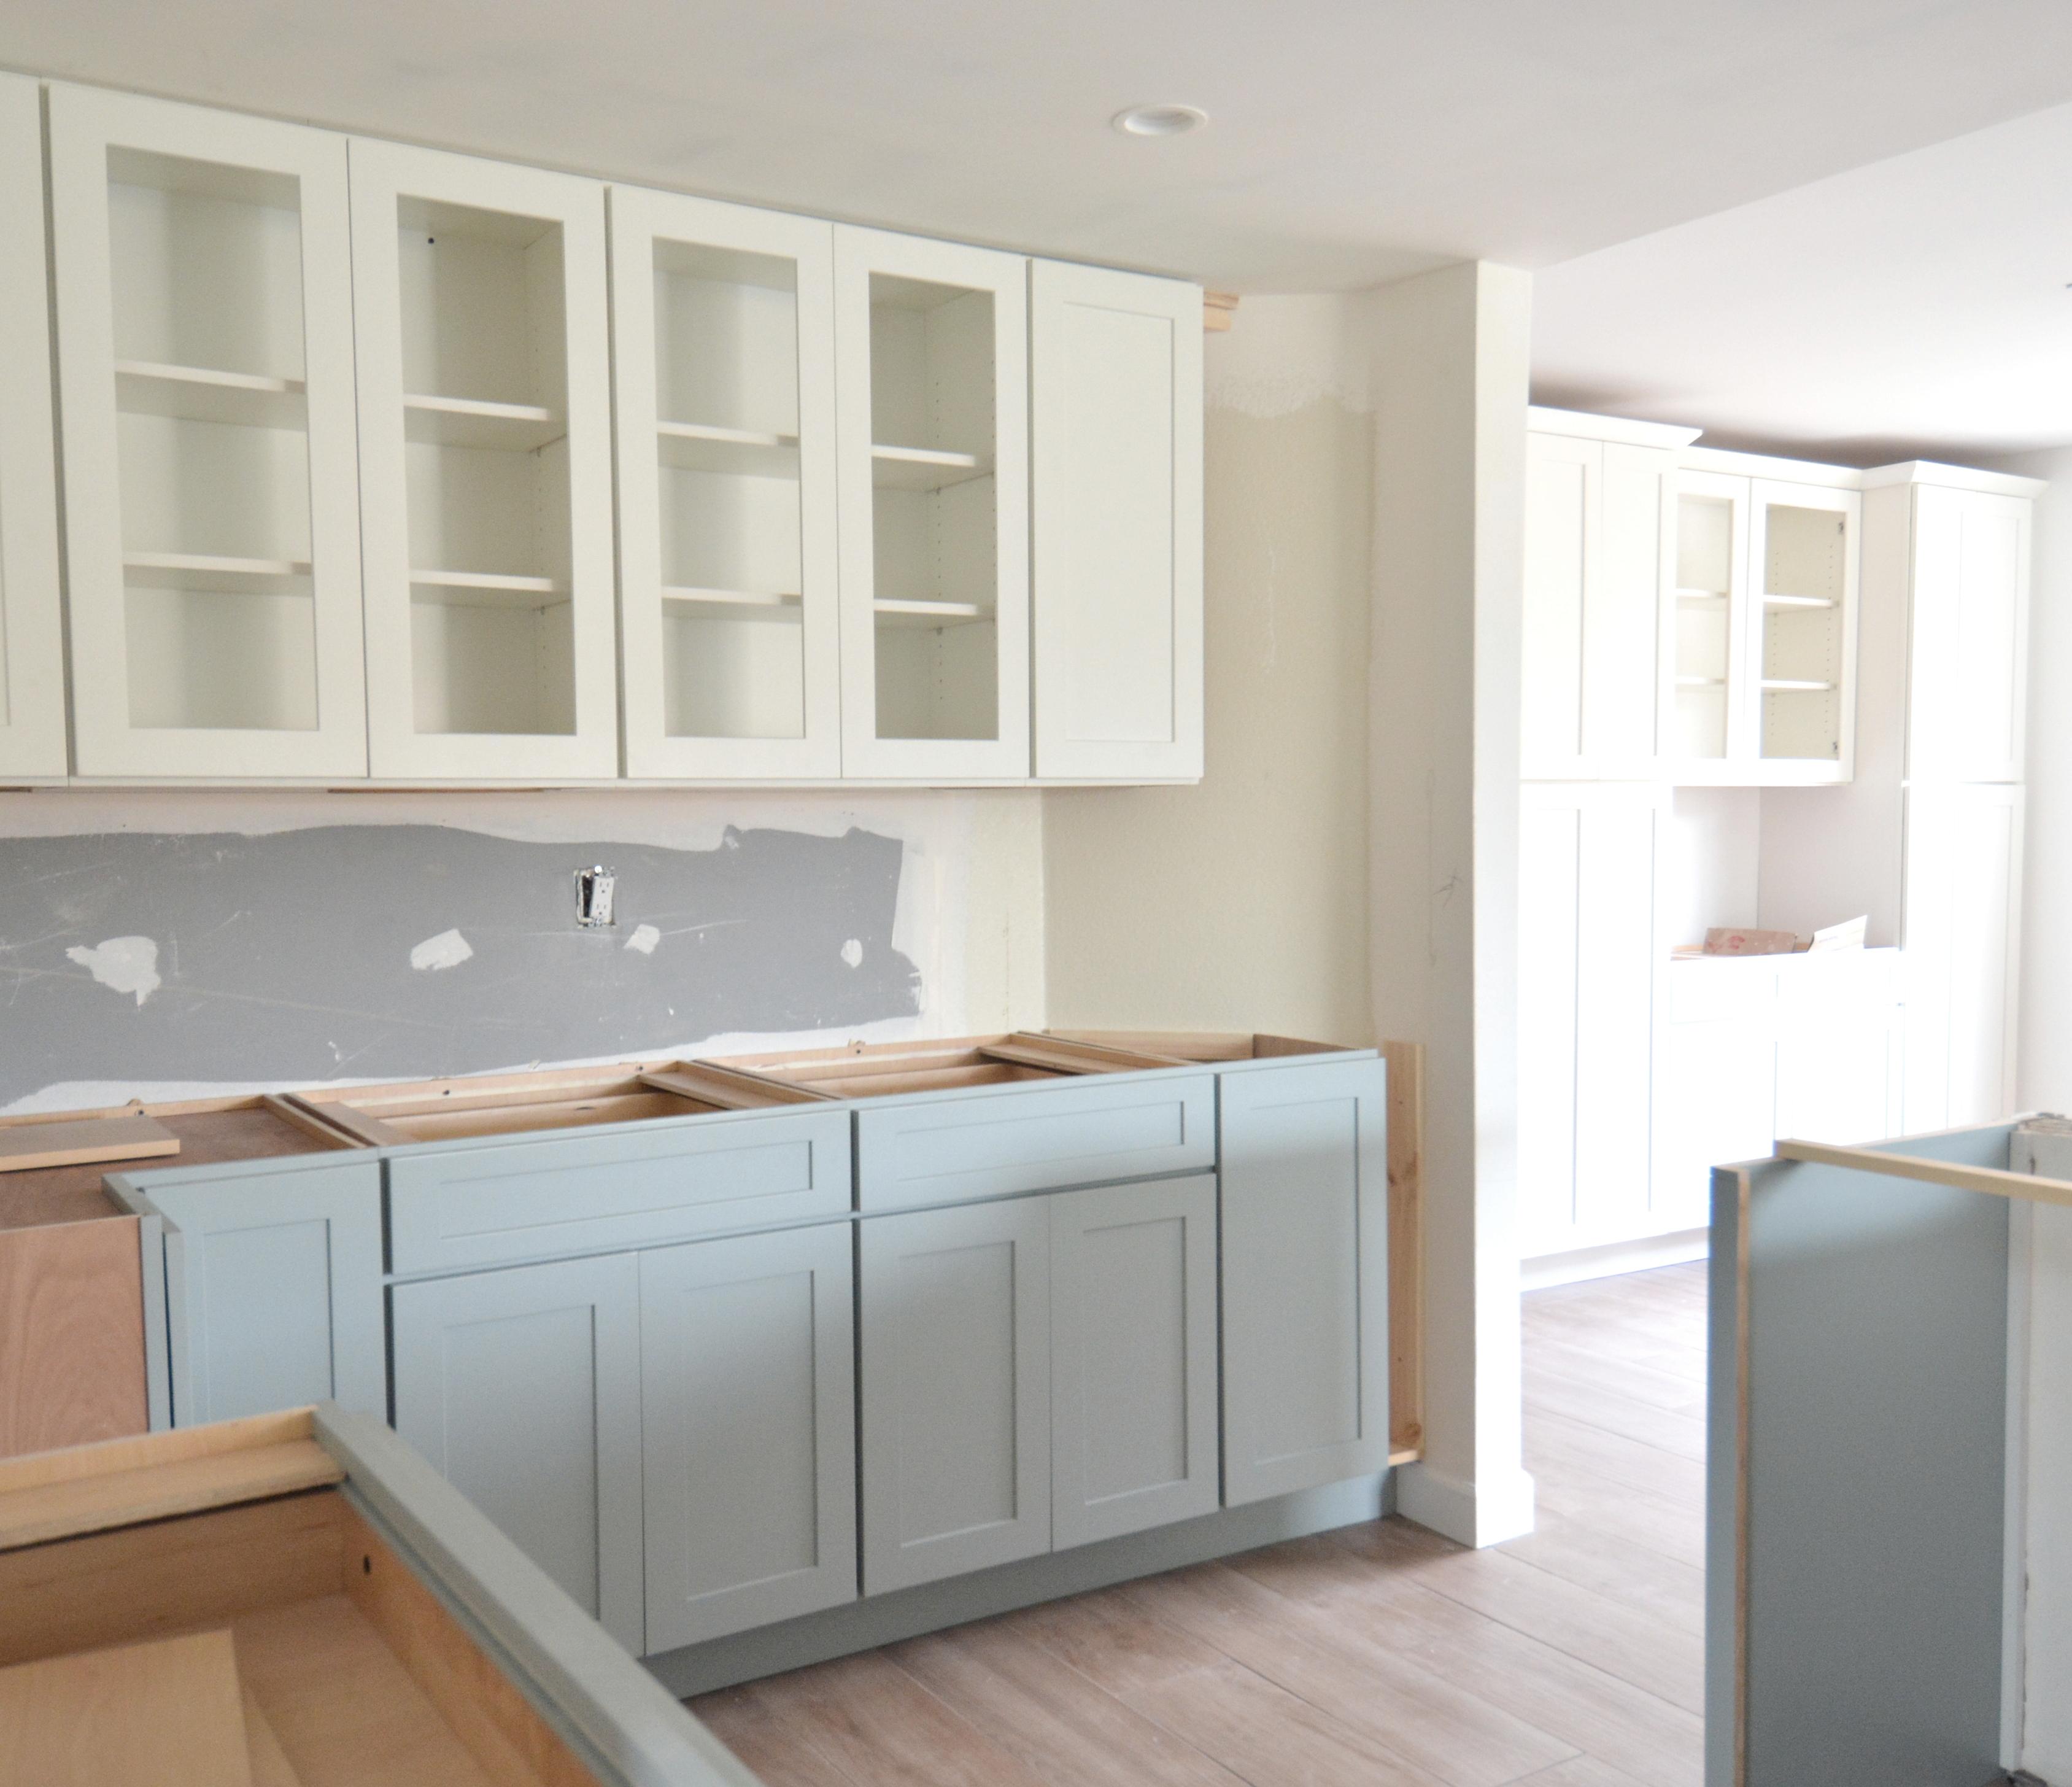 Kitchen Remodel: 10 Lessons